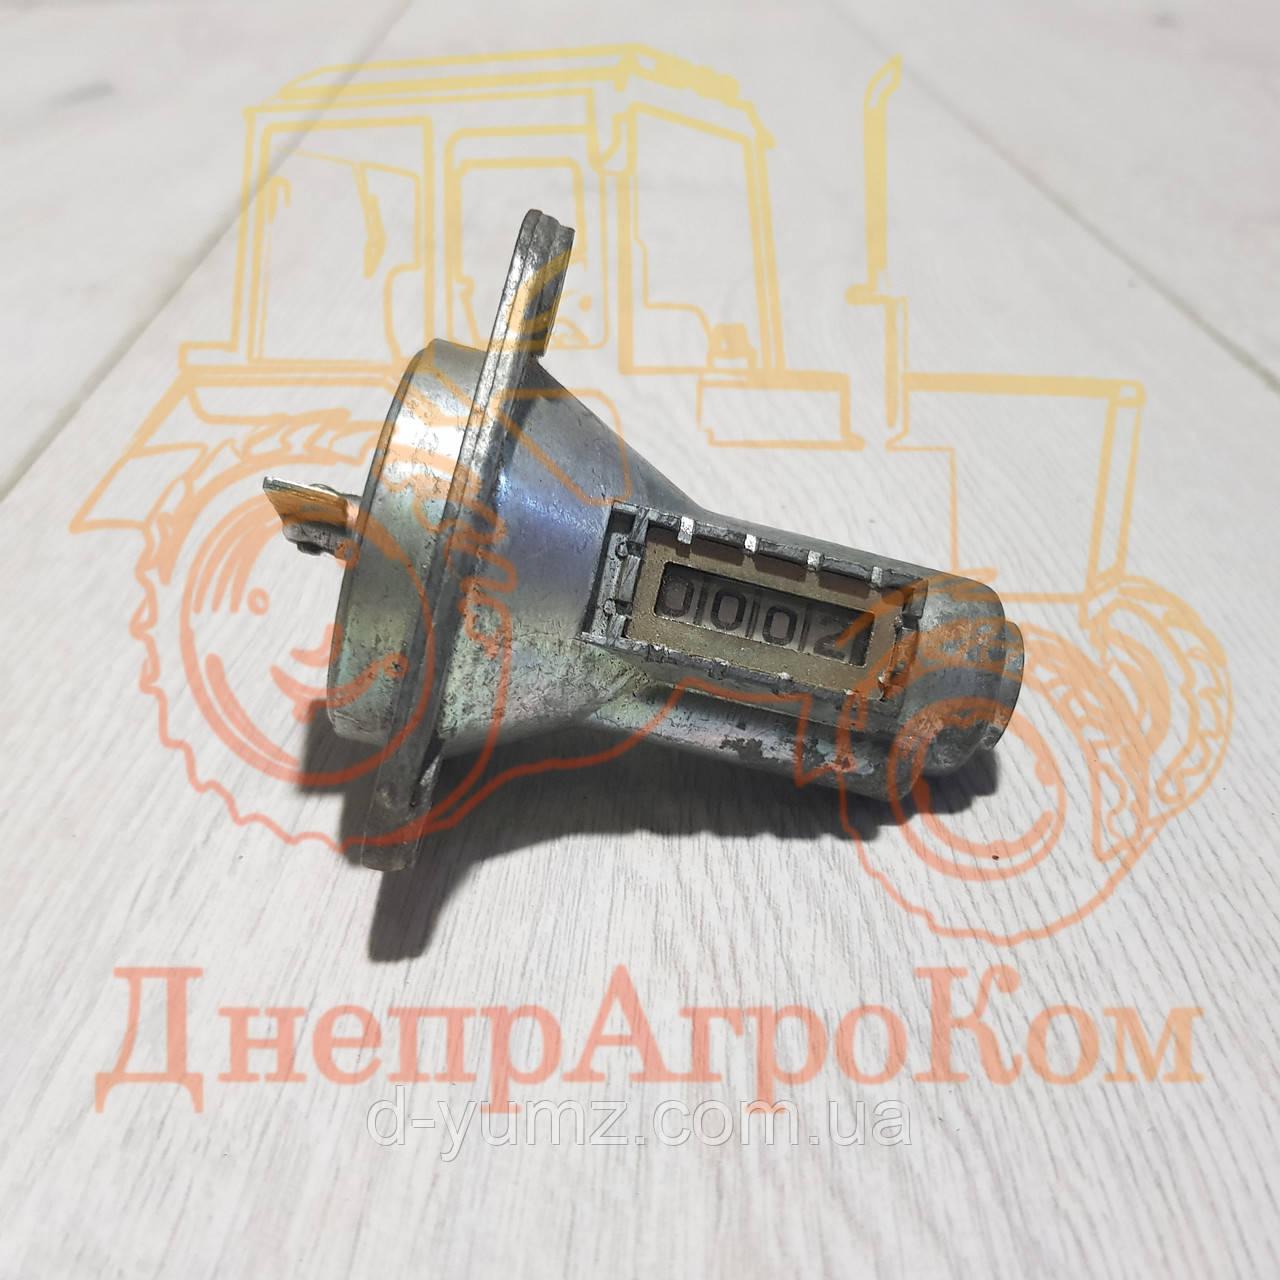 Счетчик моторочасов ЮМЗ Д65-19-С01